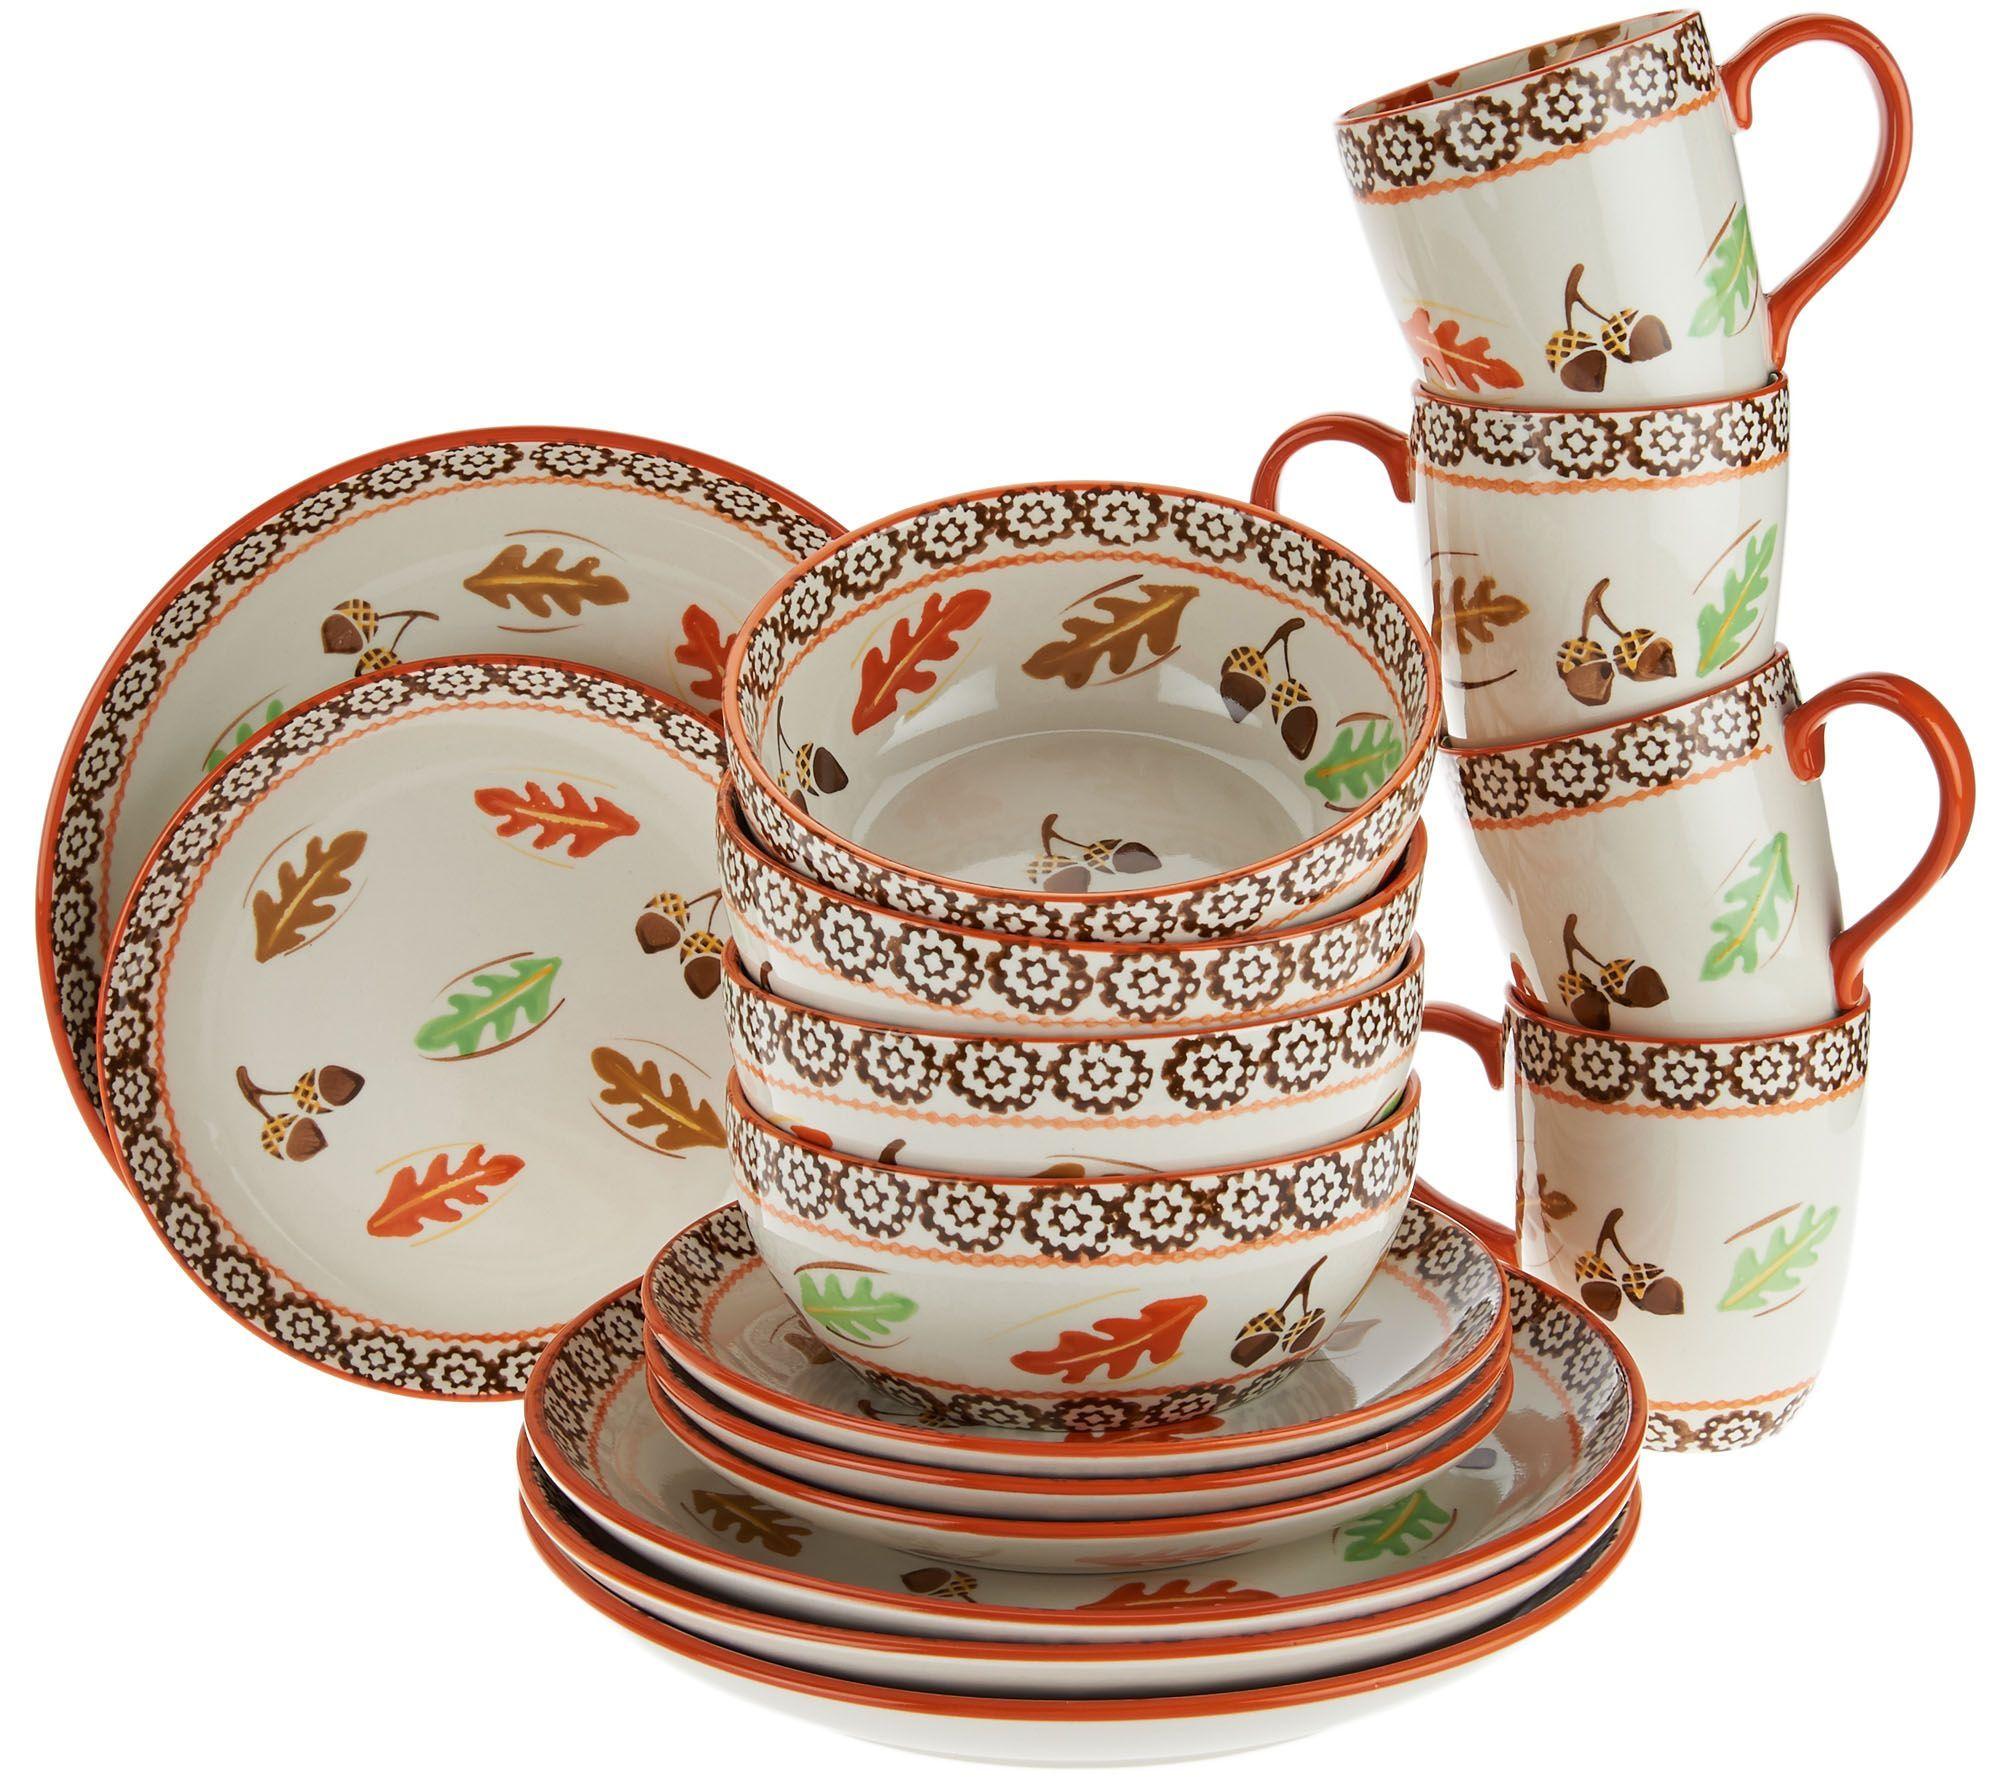 Temp-tations Harvest Dinnerware  sc 1 st  Pinterest & Temp-tations Harvest Dinnerware | All Things Shopping | Pinterest ...